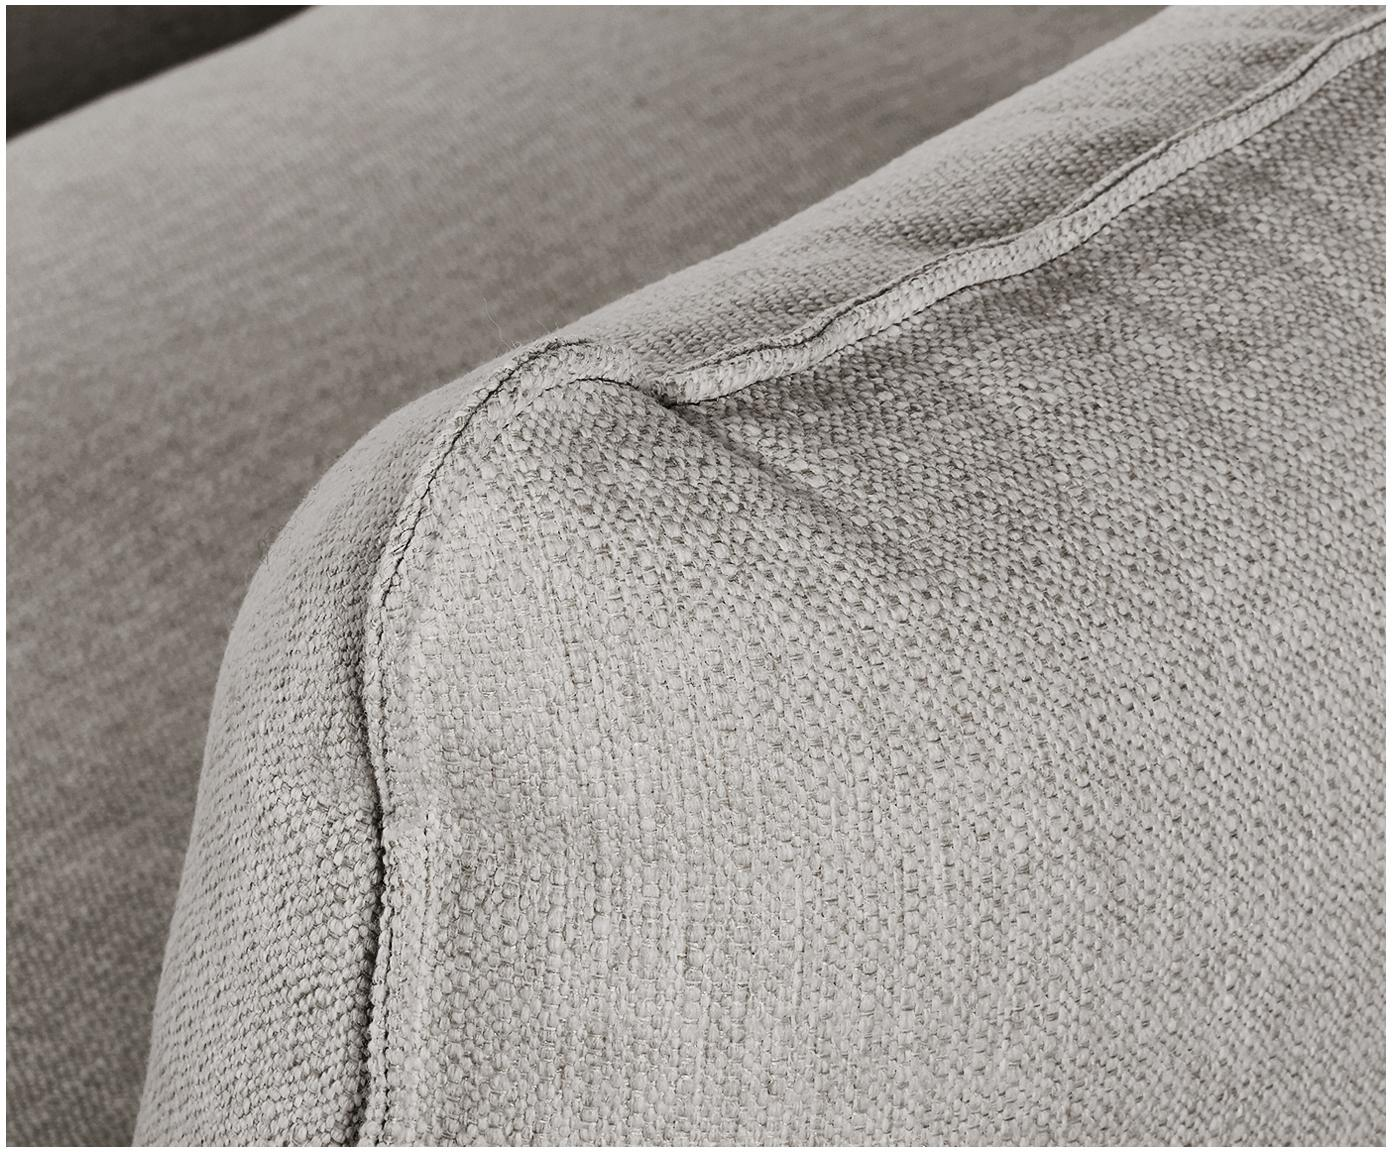 Duża sofa narożna Tribeca, Tapicerka: poliester Tkanina o odpor, Stelaż: lite drewno sosnowe, Nogi: lite drewno sosnowe, laki, Beżowoszary, S 274 x G 192 cm